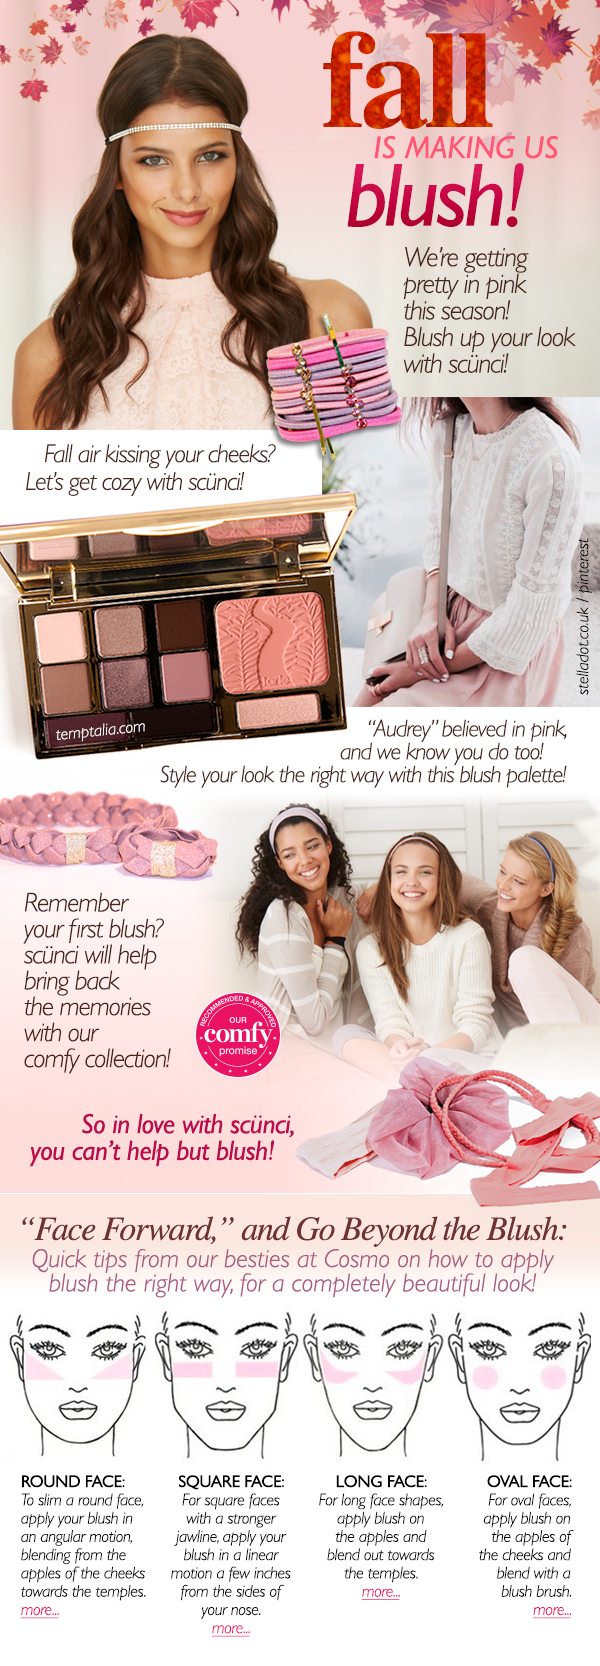 Fall Blush Campaign